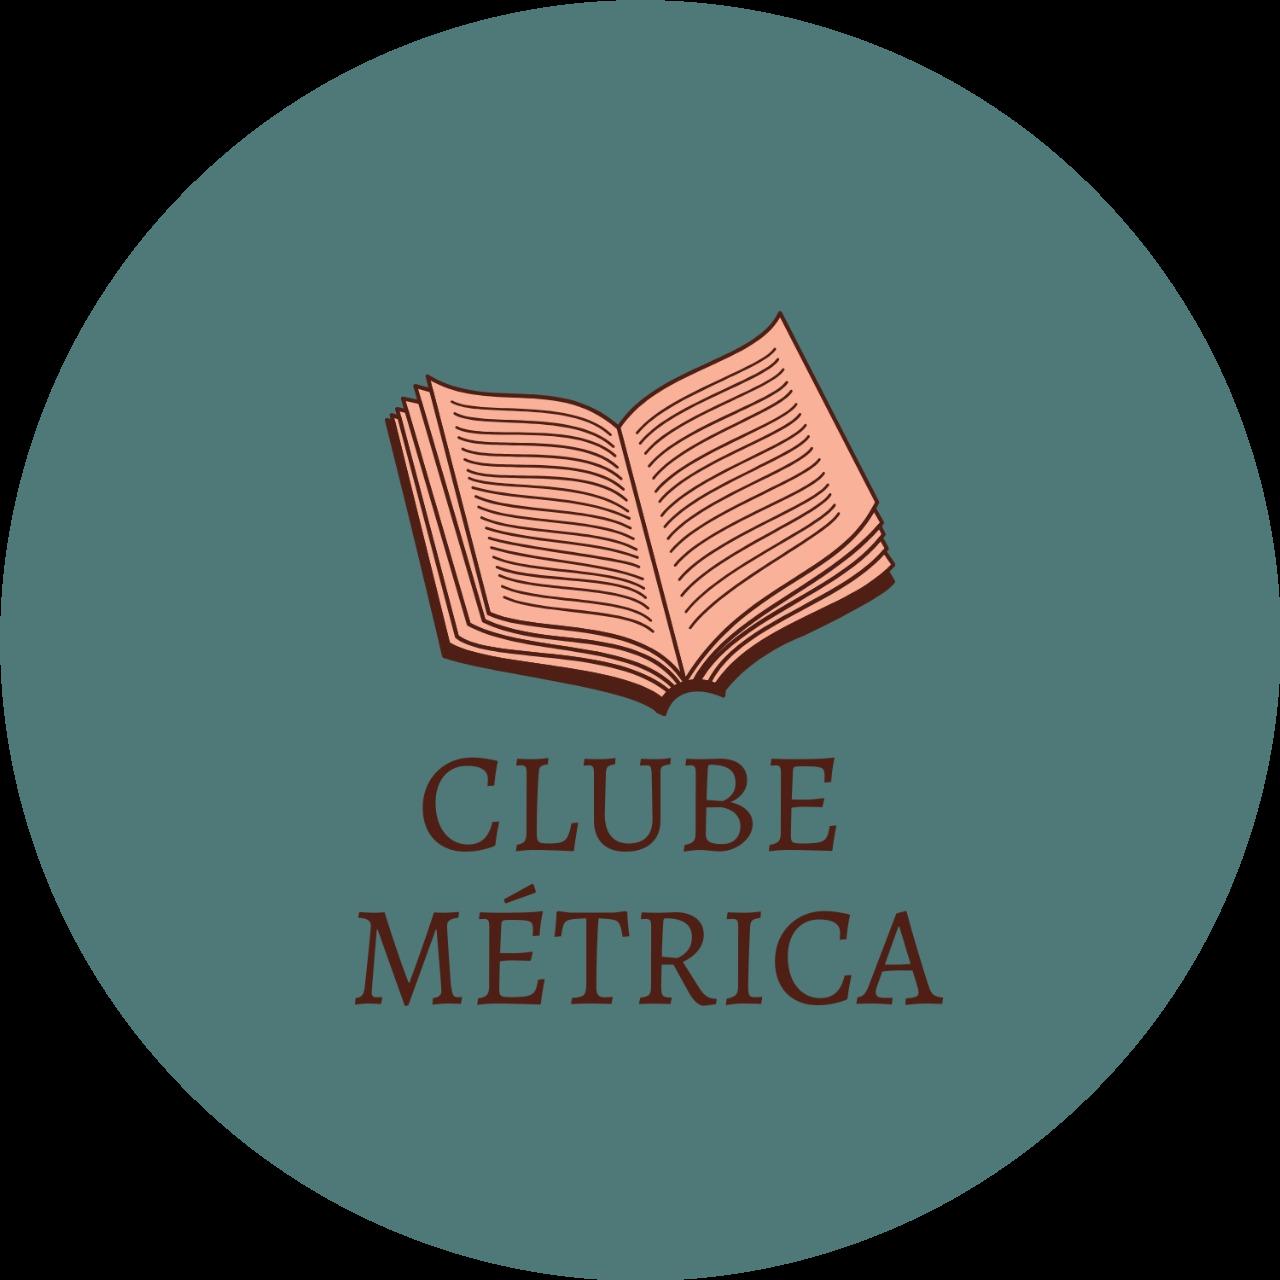 Clube Métrica